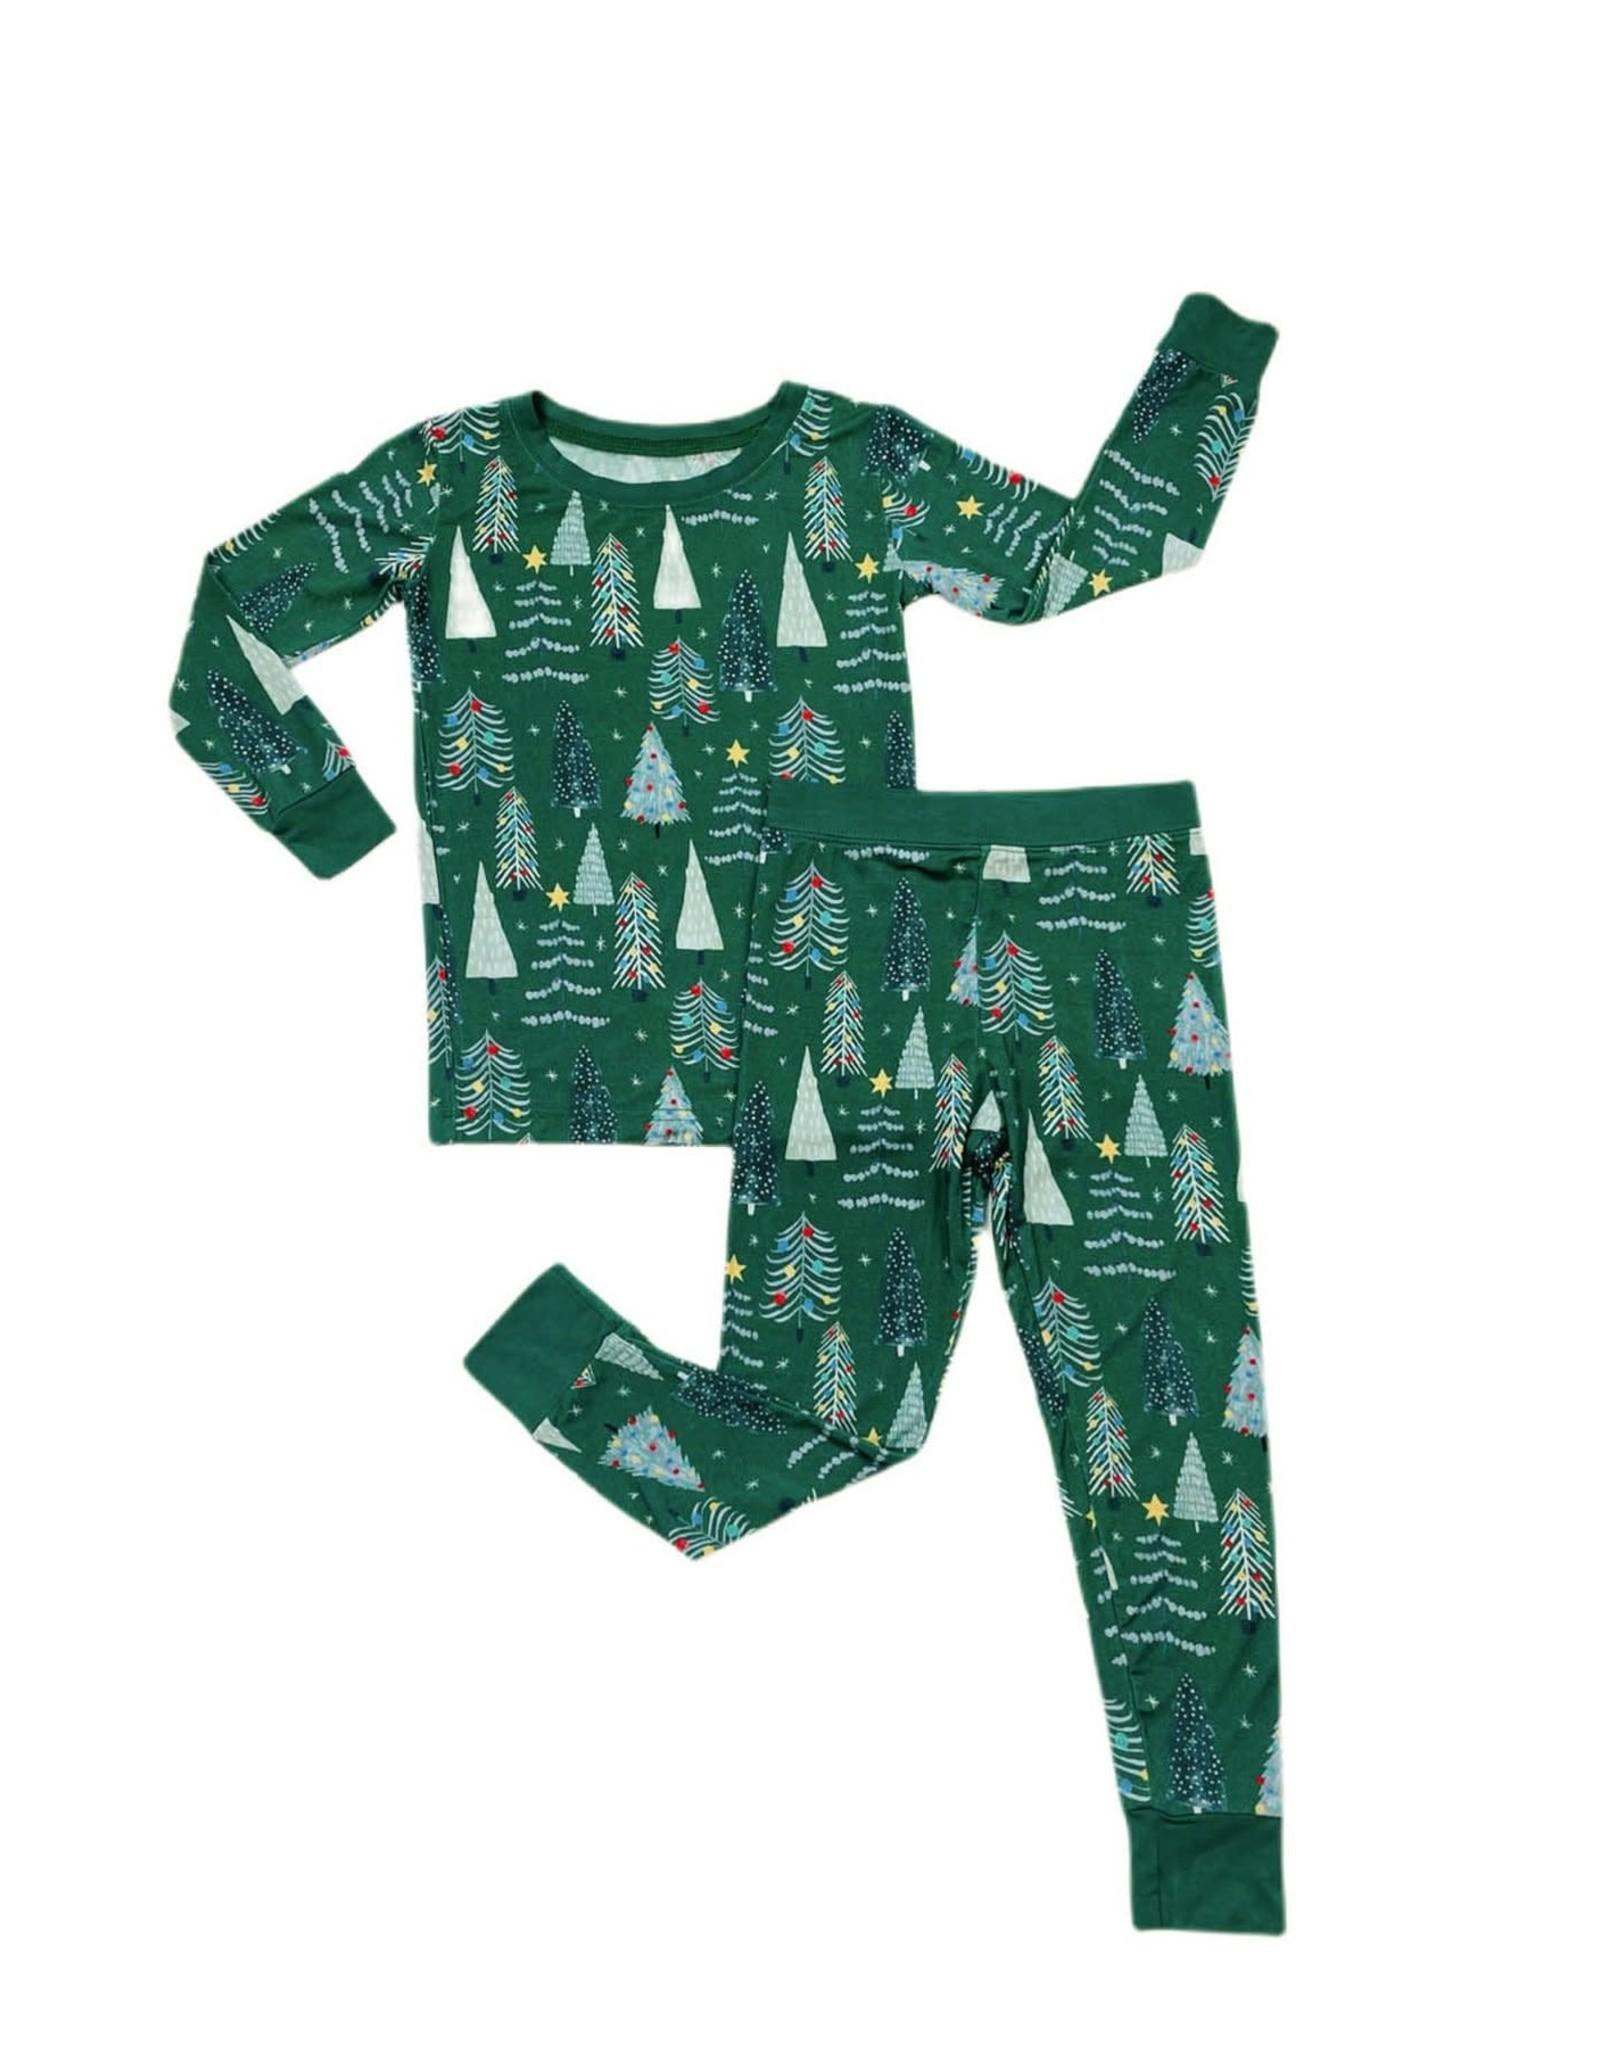 Little Sleepies Green Twinkling Trees Two-Piece Pajama Set